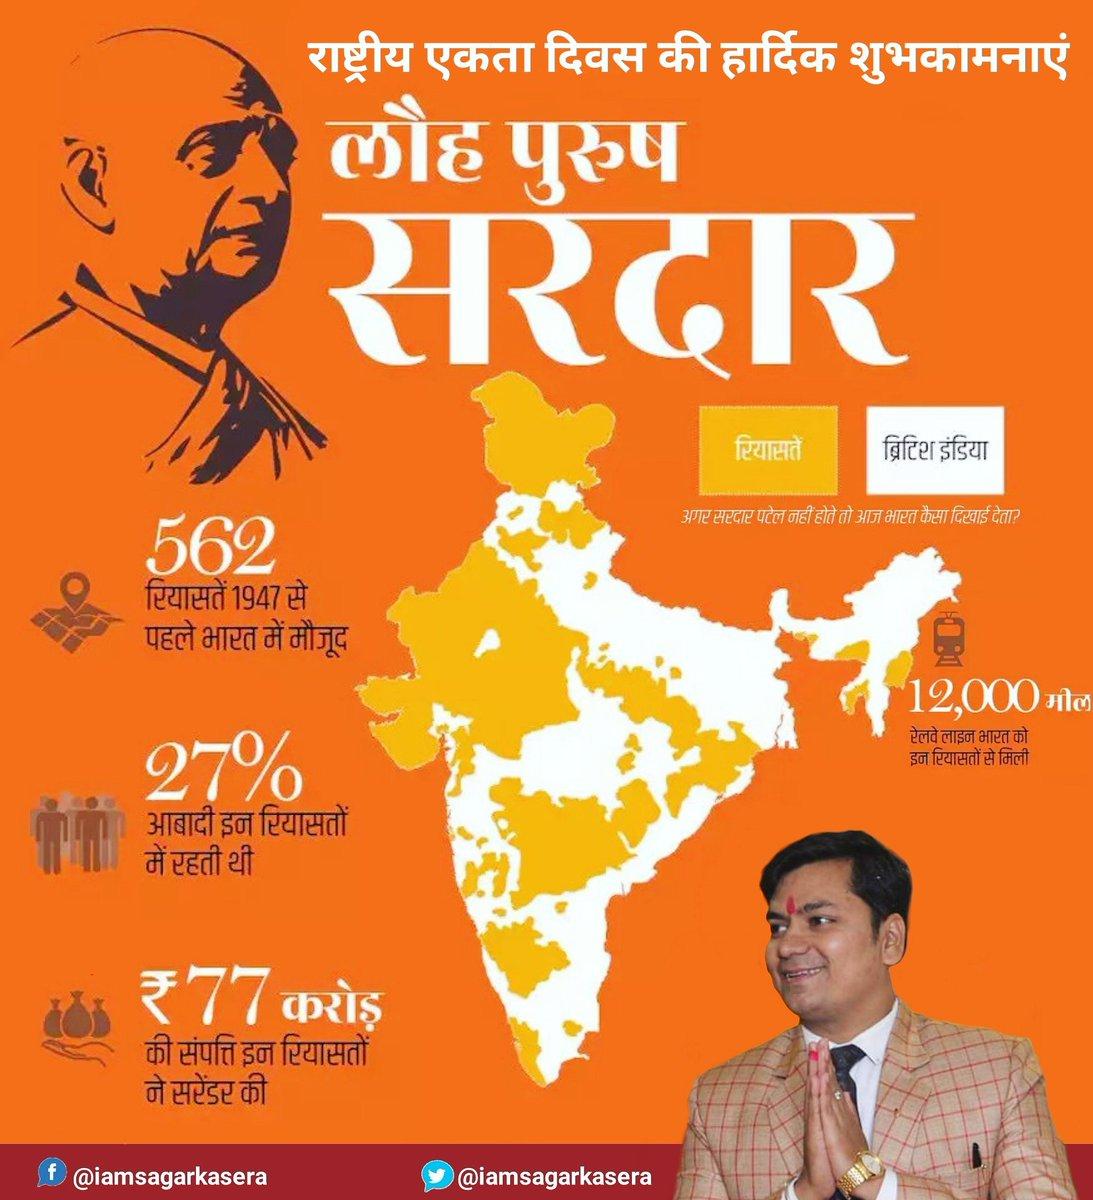 Paying homage to #SardarVallabhbhaiPatel on his Birth anniversary who united the Princely States. Nation would celebrate this day as #unityday / #EktaDivas #SardarPatelStatue #RashtriyaEktaDiwas #NationalUnityDiwas #IronManOfIndia #SardarPatelJayanti @IndiaTodaypic.twitter.com/V8sOanECcC